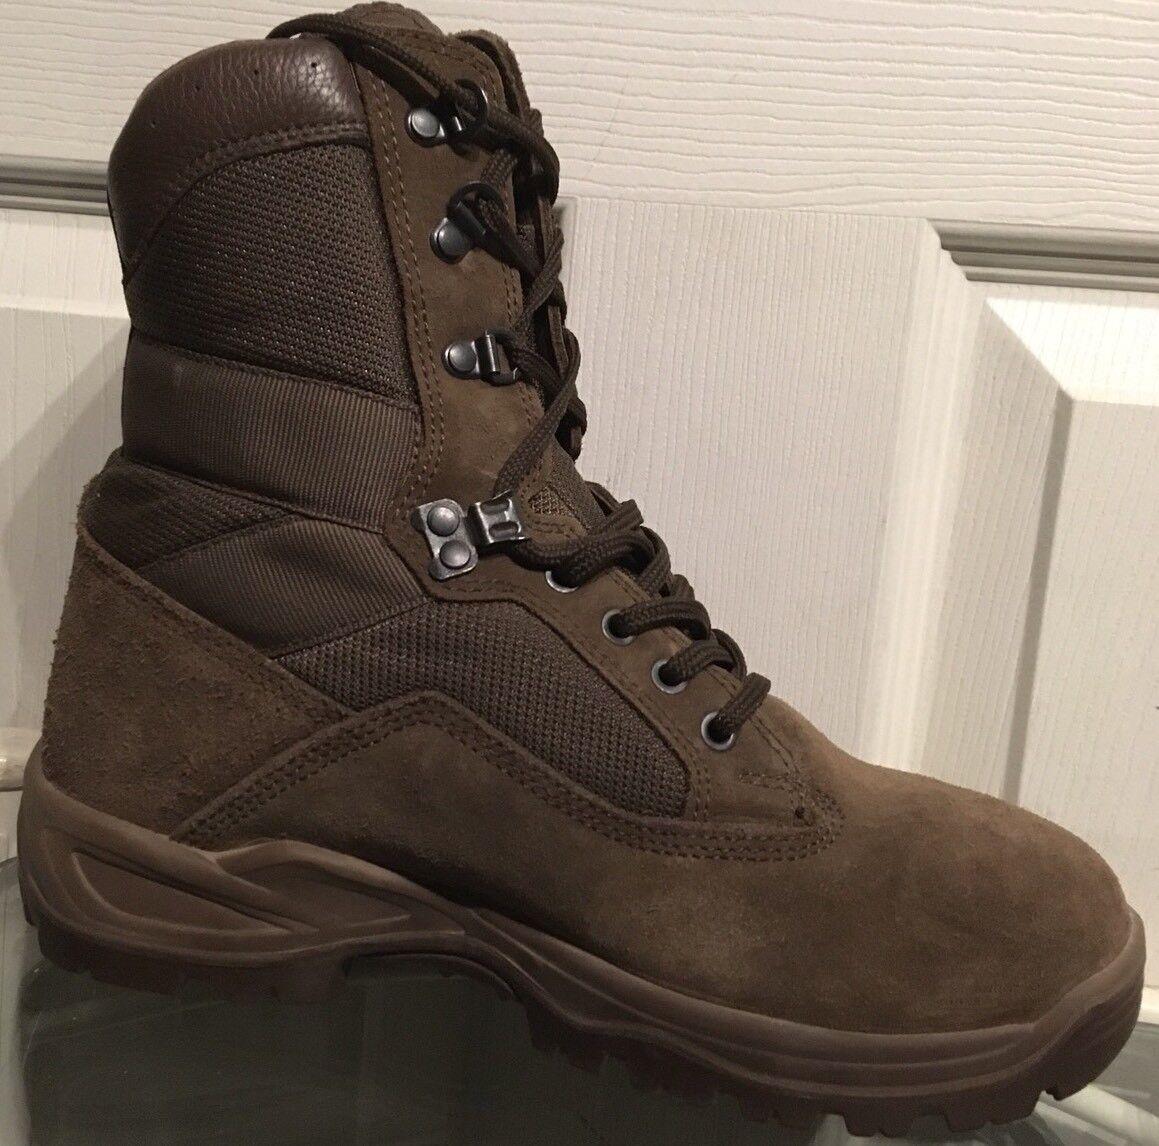 YDS Falcon Army Issue Braun Braun Issue Suede MTP Female Combat/Assault Stiefel 6M YDF26M 593873